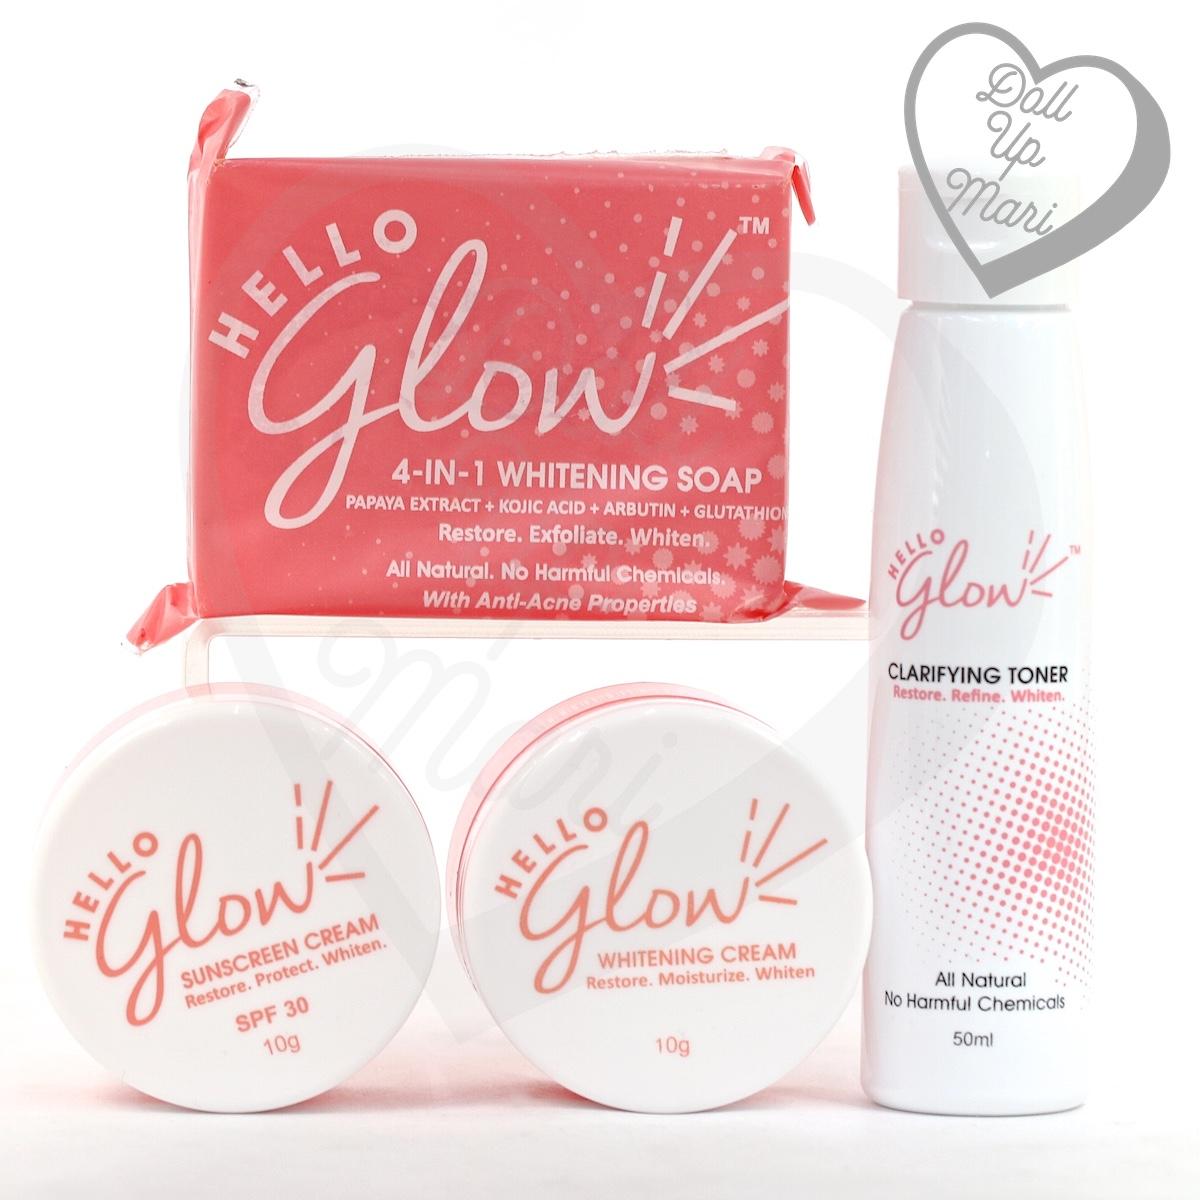 Hello Glow by Ever Bilena product spread